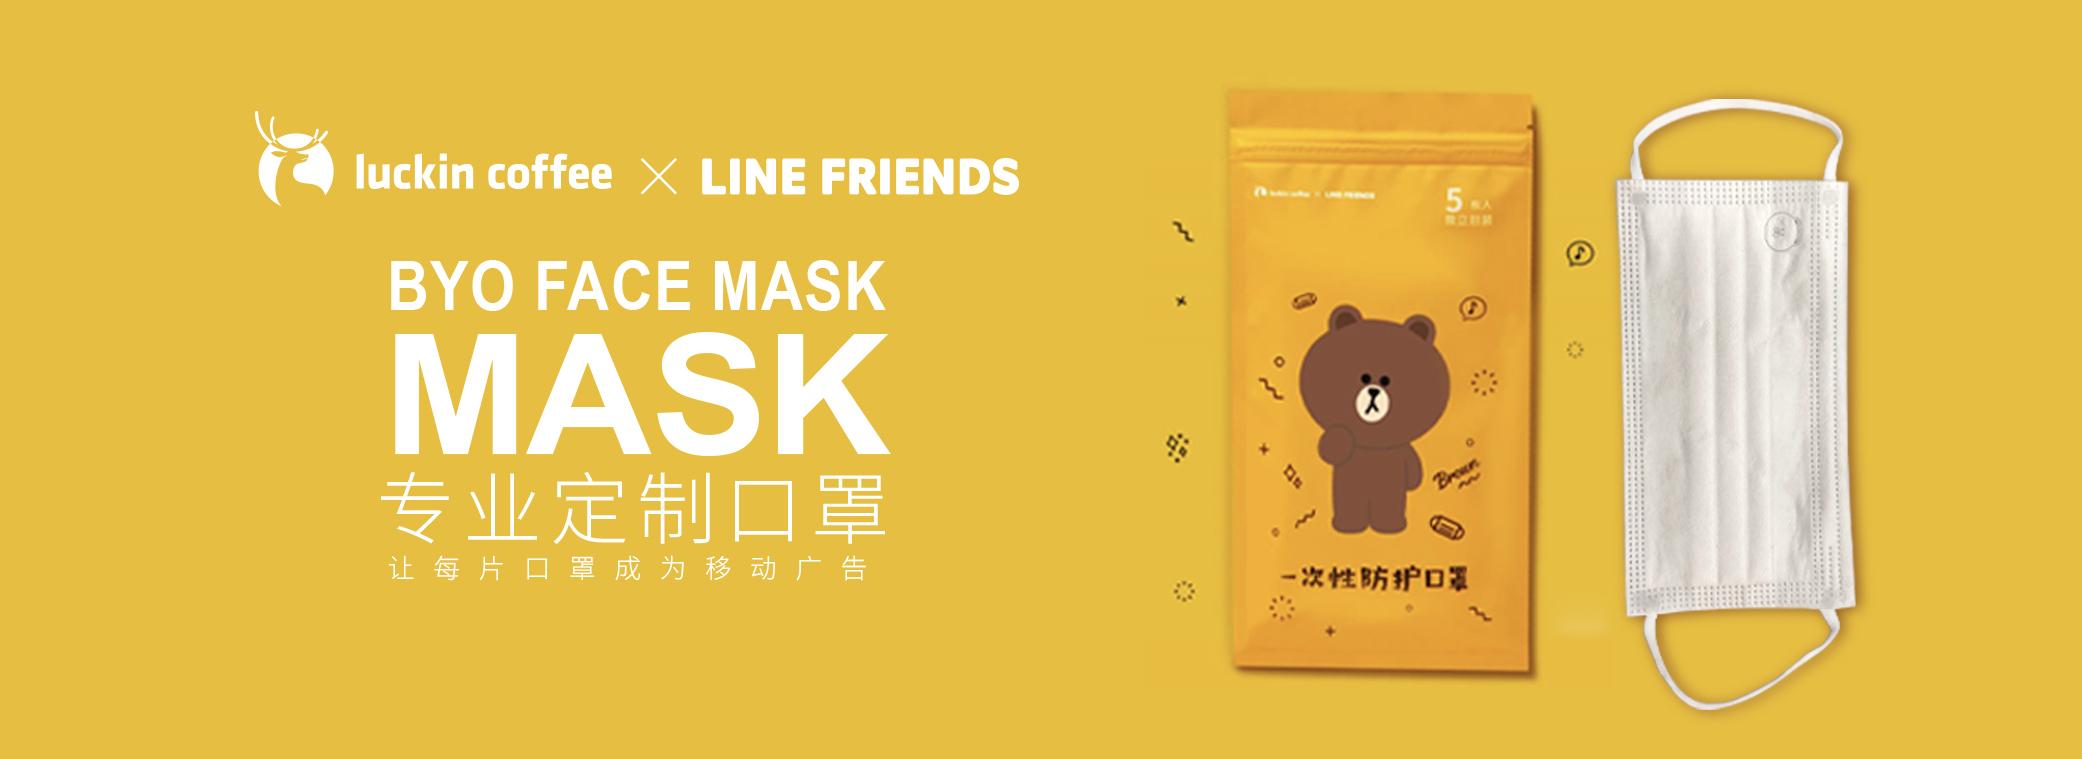 boy face mask